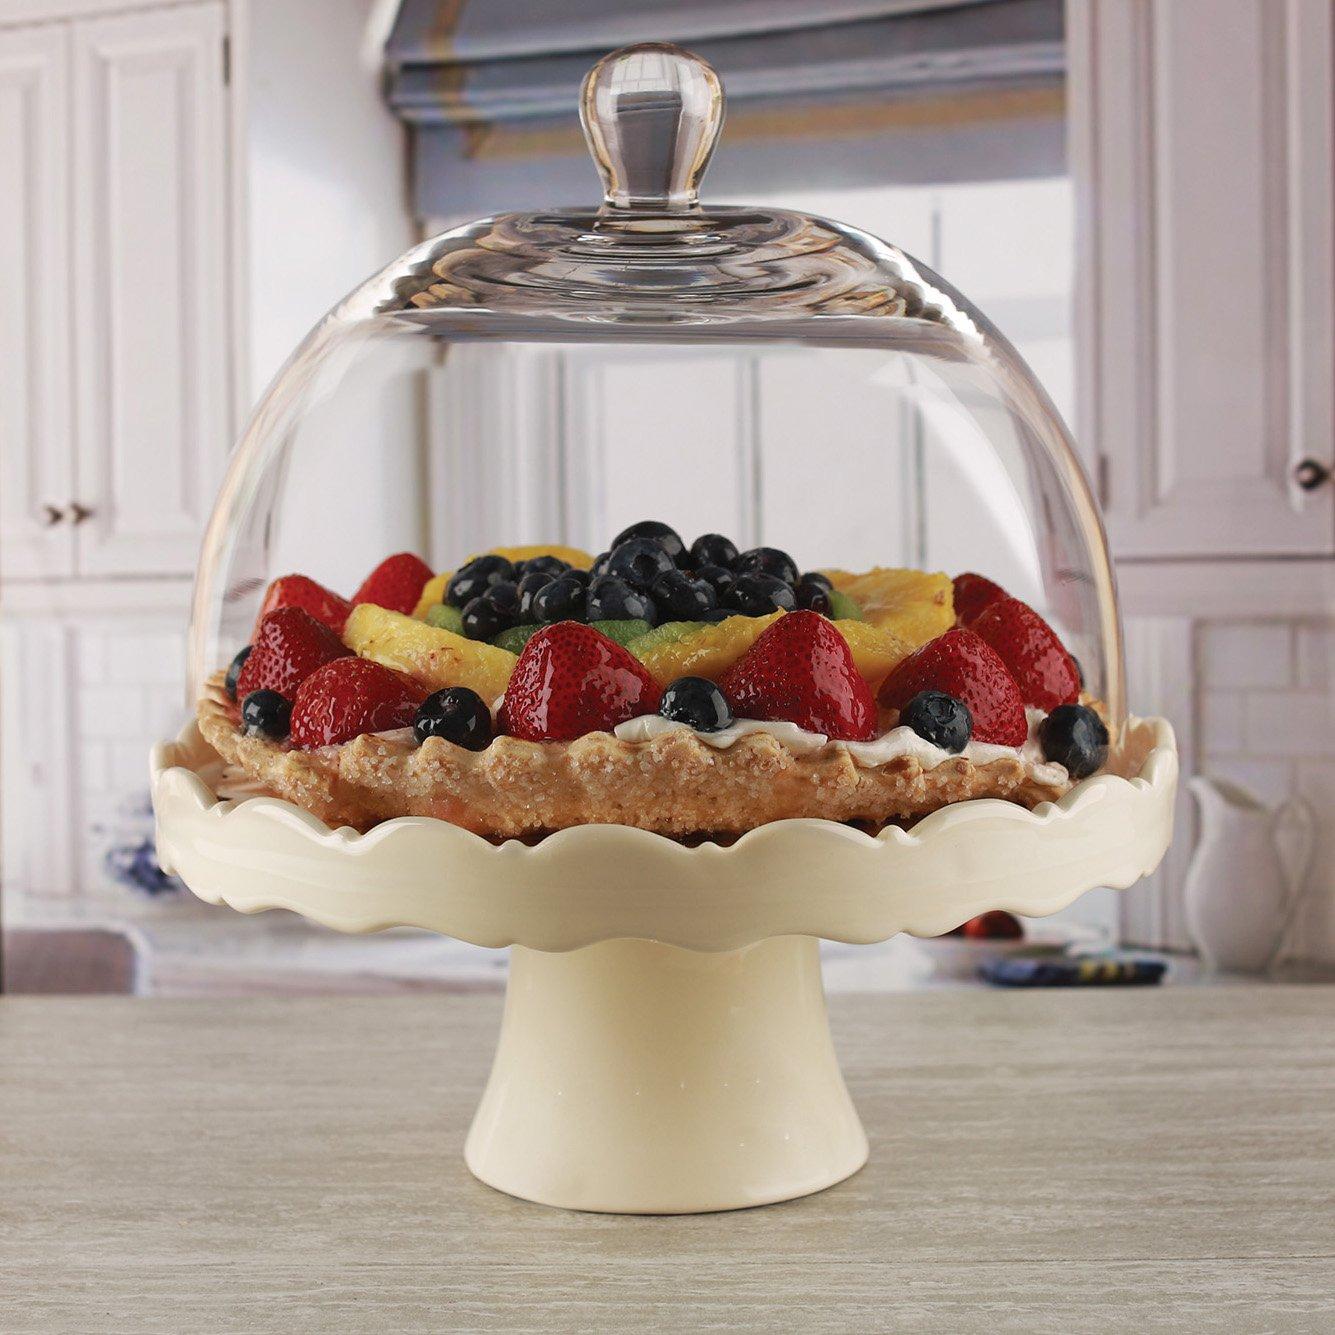 Circleware 55144 Dolche Torta Cream Ceramic Cake Plate with Round Dome-11